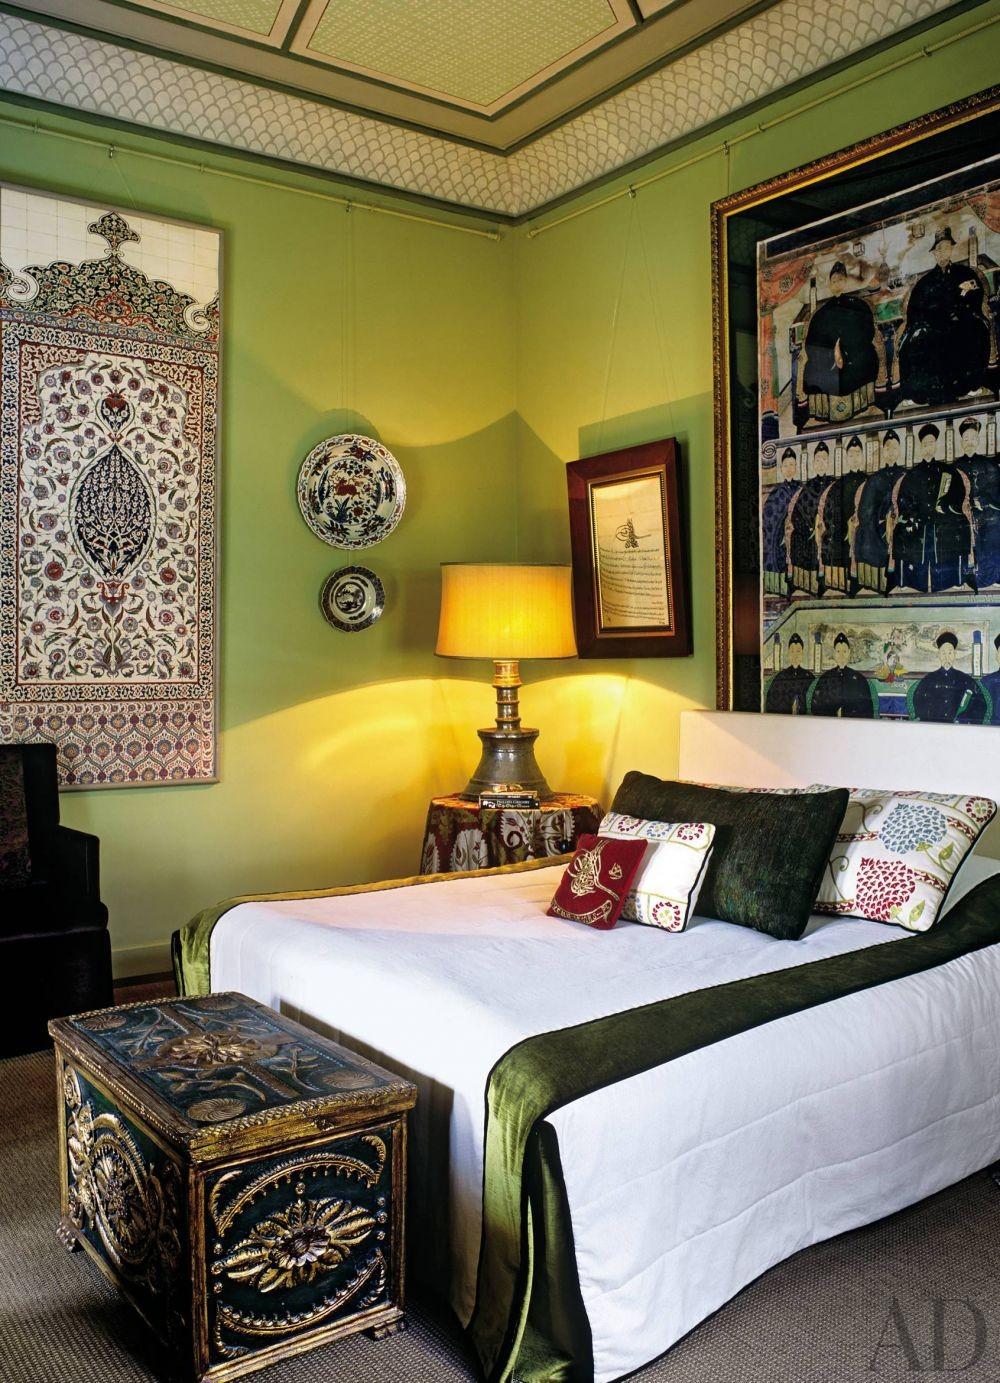 Exotic Bedroom by Serdar Gülgün in Istanbul